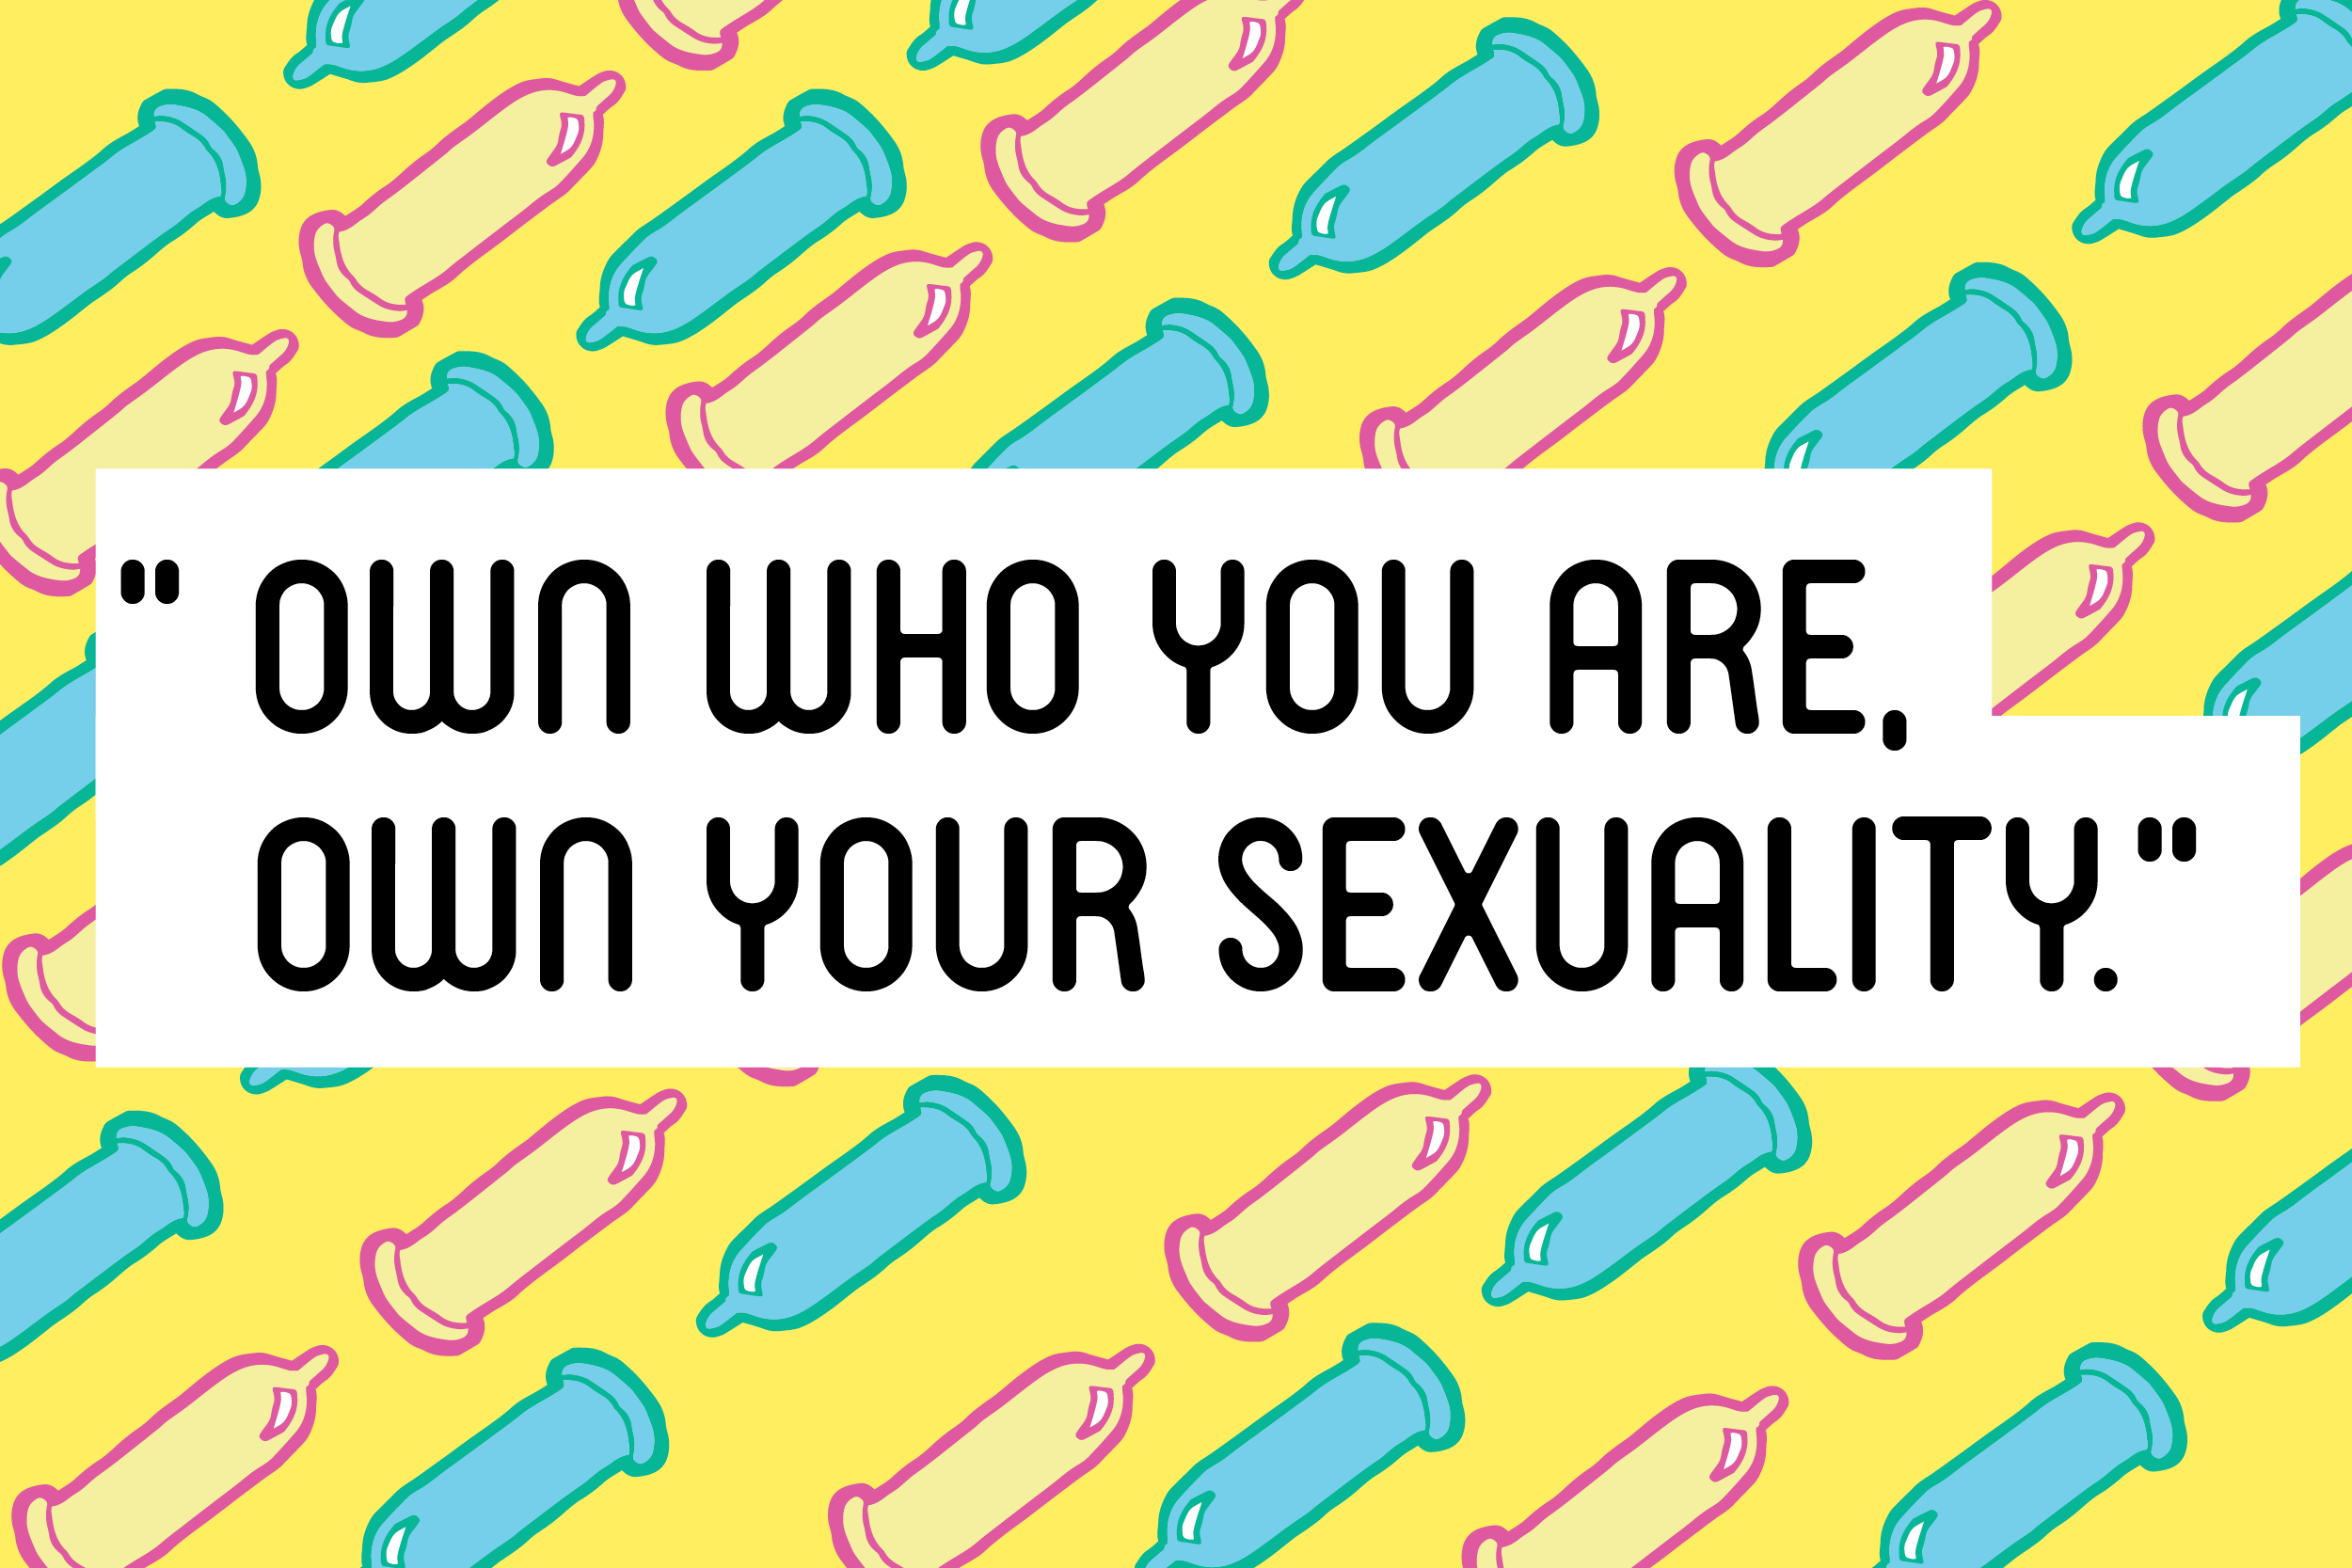 AsexualQuotes_4